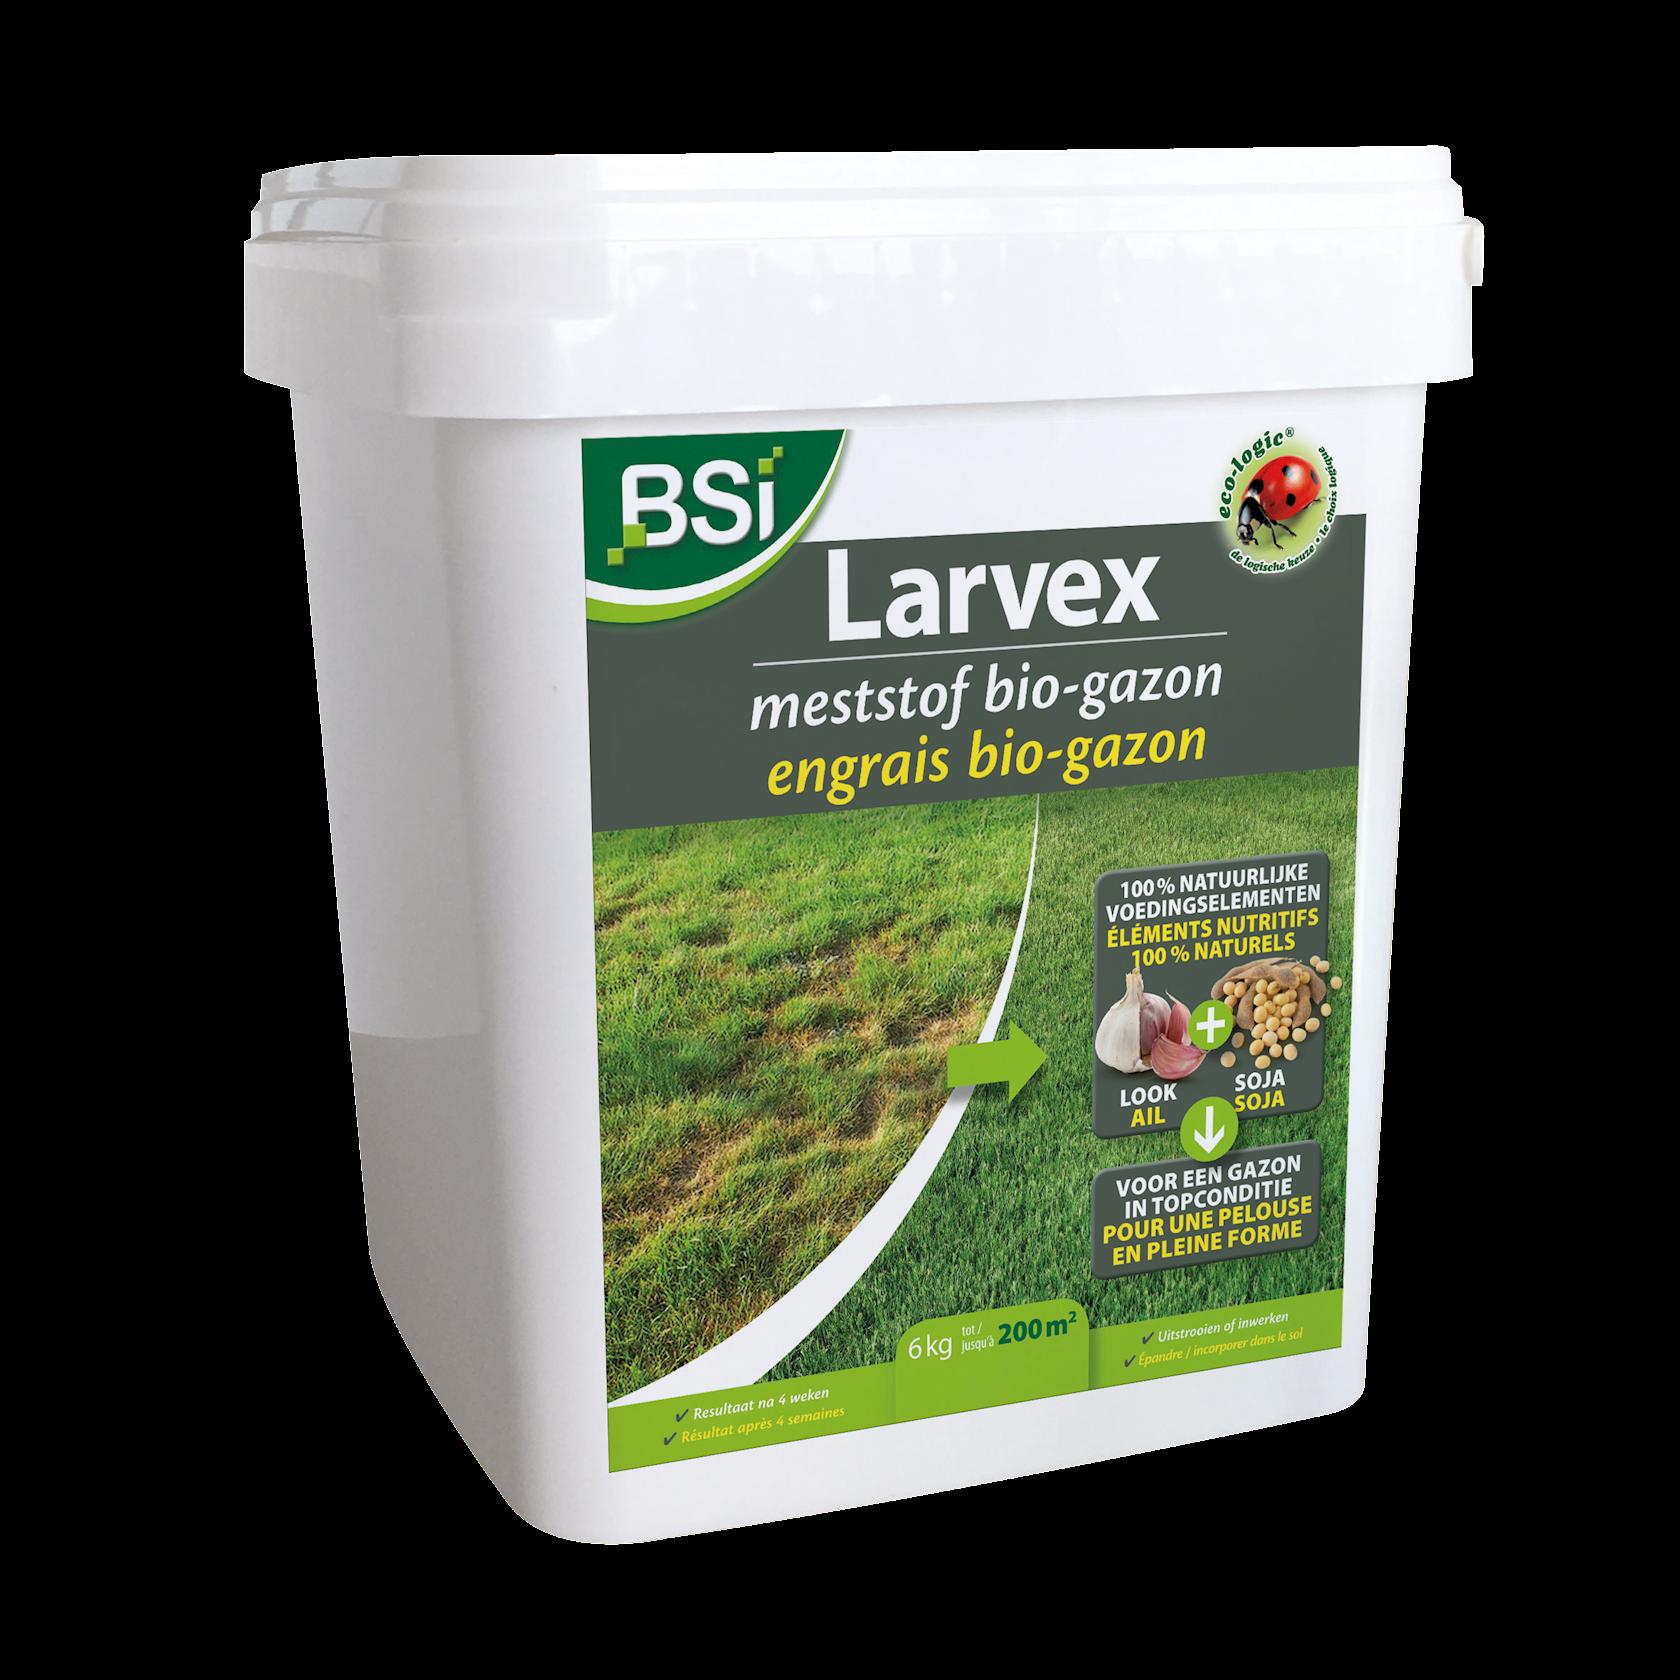 Larvex-meststof-Bio-gazon-6kg-BE-